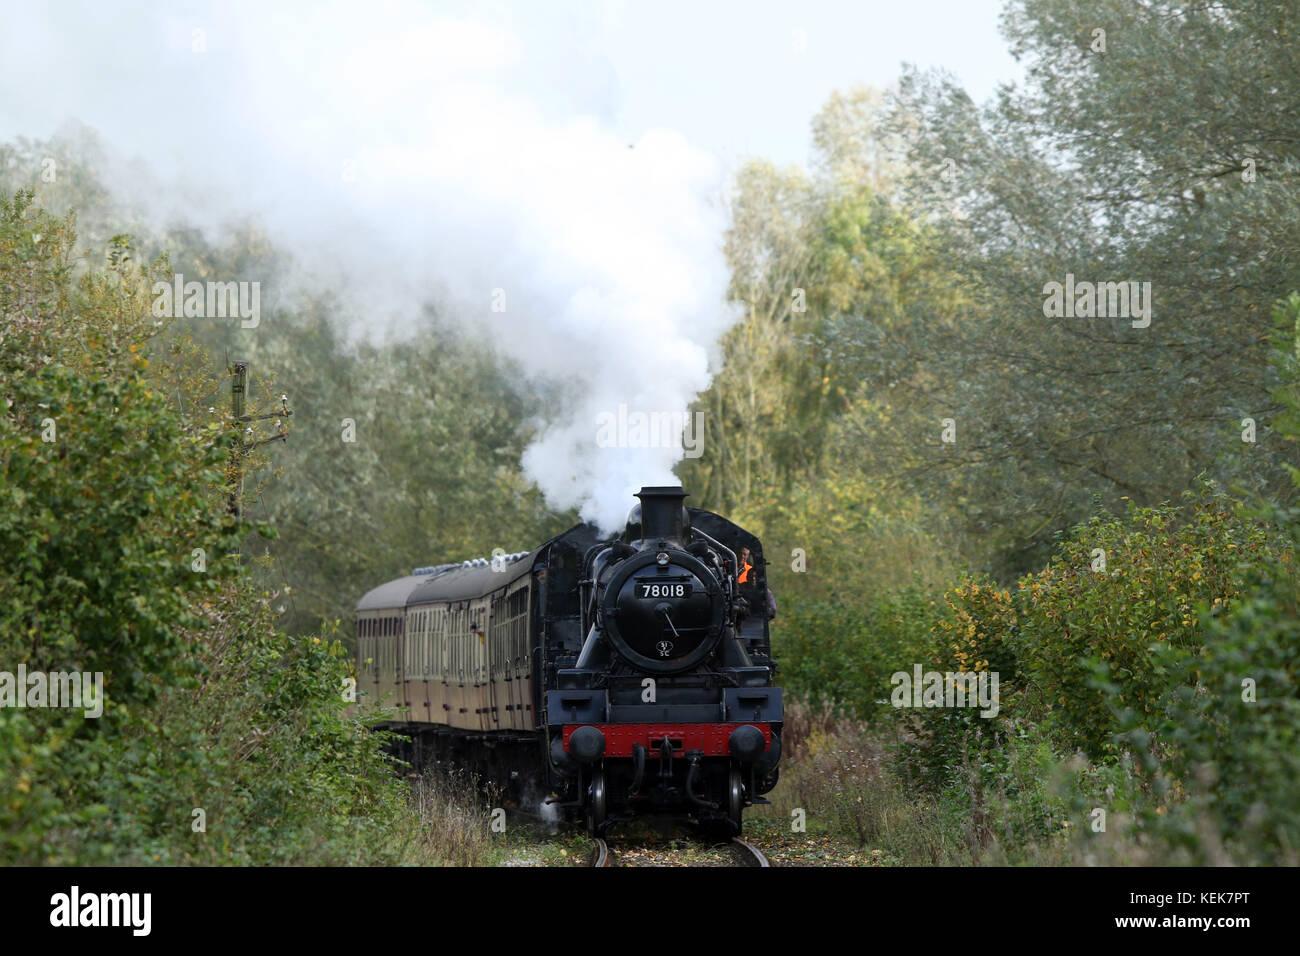 Peterborough, UK. 21st Oct, 2017. A steam locomotive train 78018 powers its way through Nene Park in Peterborough Stock Photo